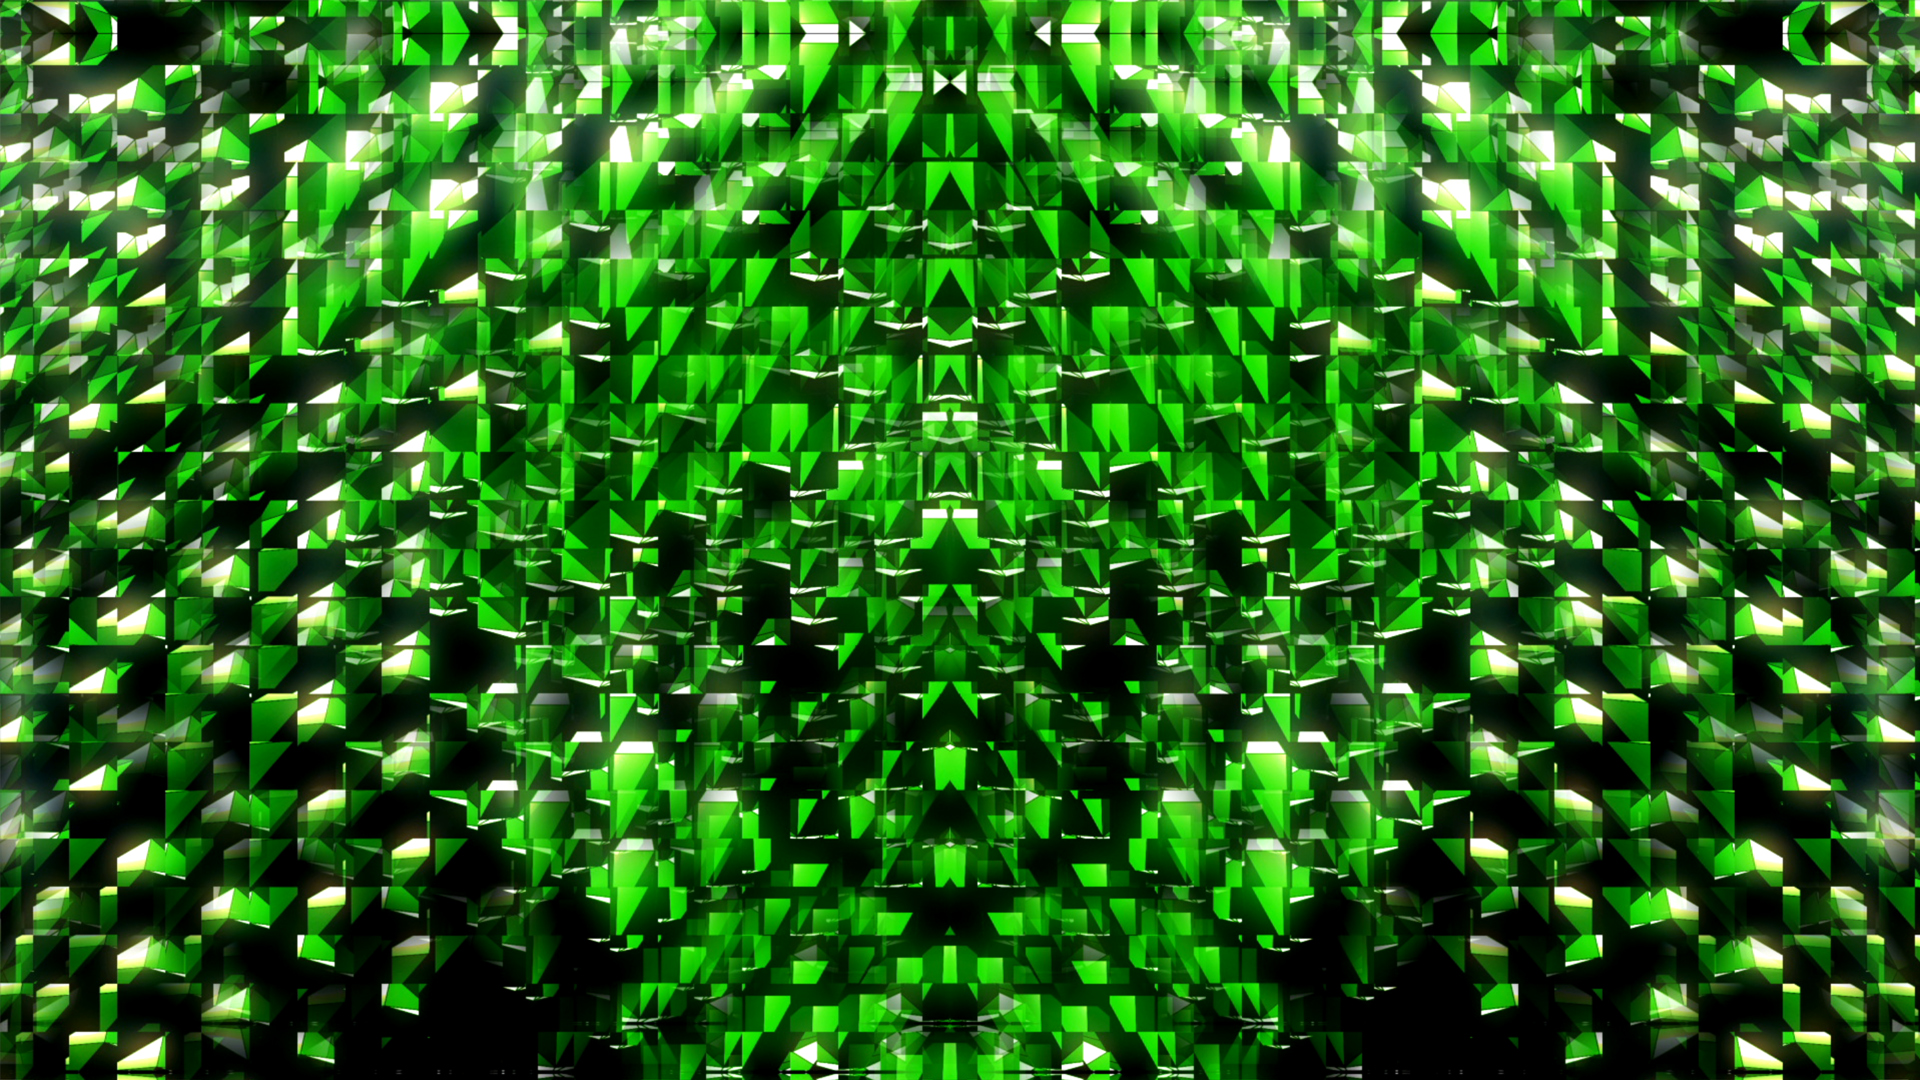 Abstract__art_pattern_texture vj loop